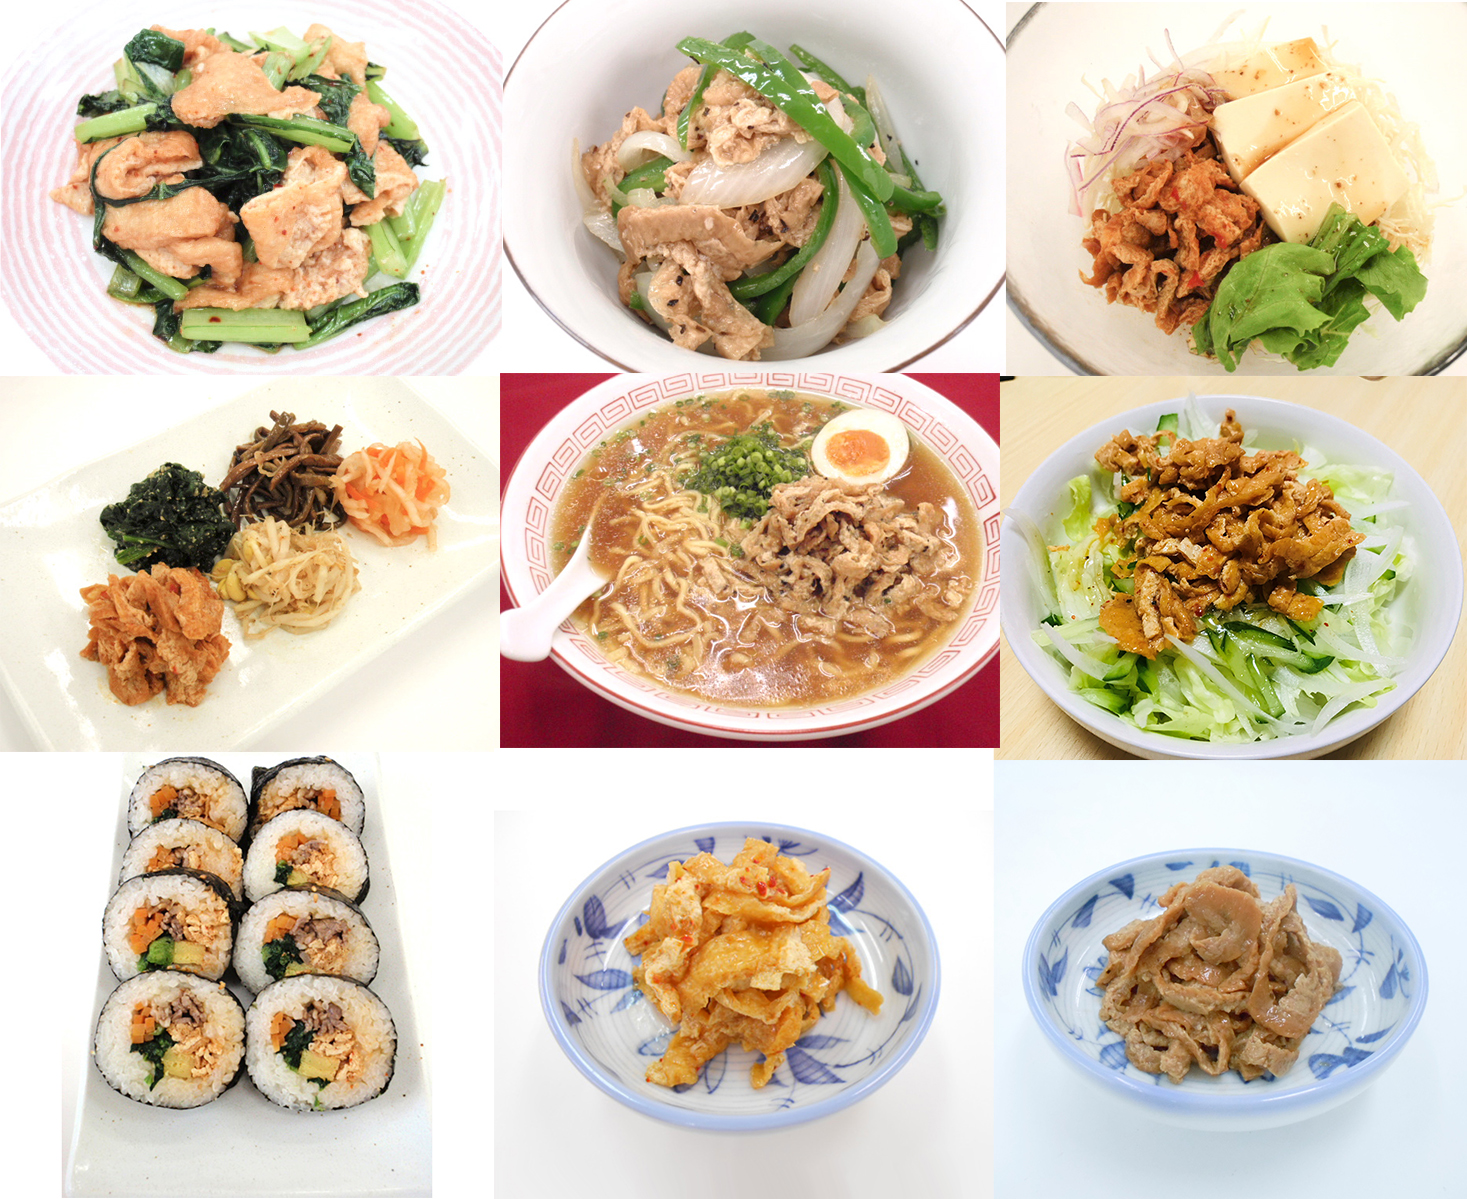 Organic Wholesale 100% Japanese Health Food Soft Tofu Manufacturing Skin